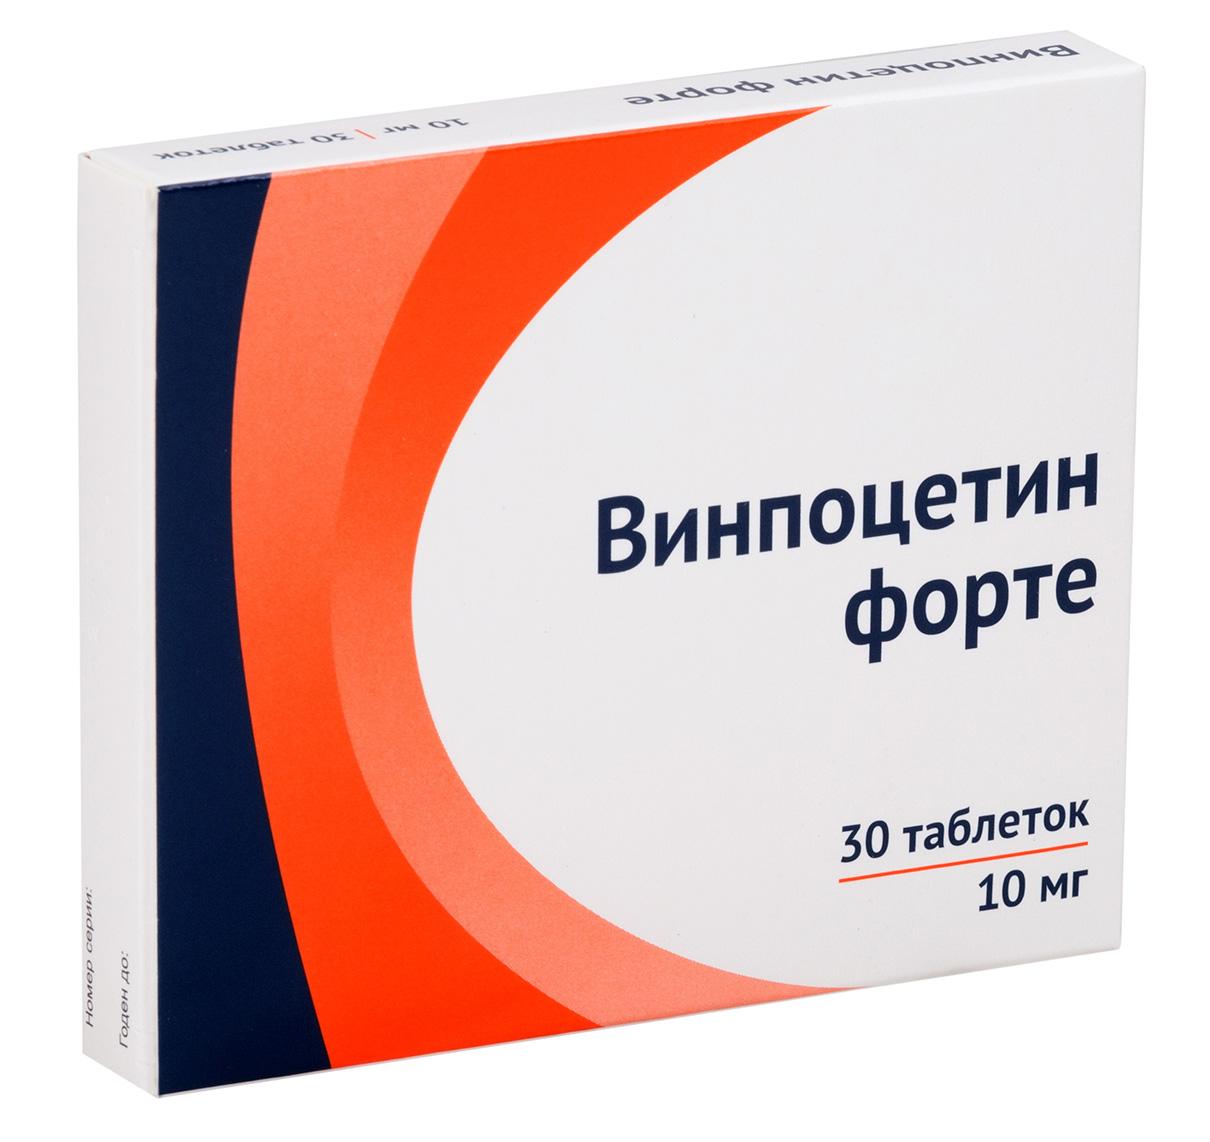 Винпоцетин форте таб. 10мг n30